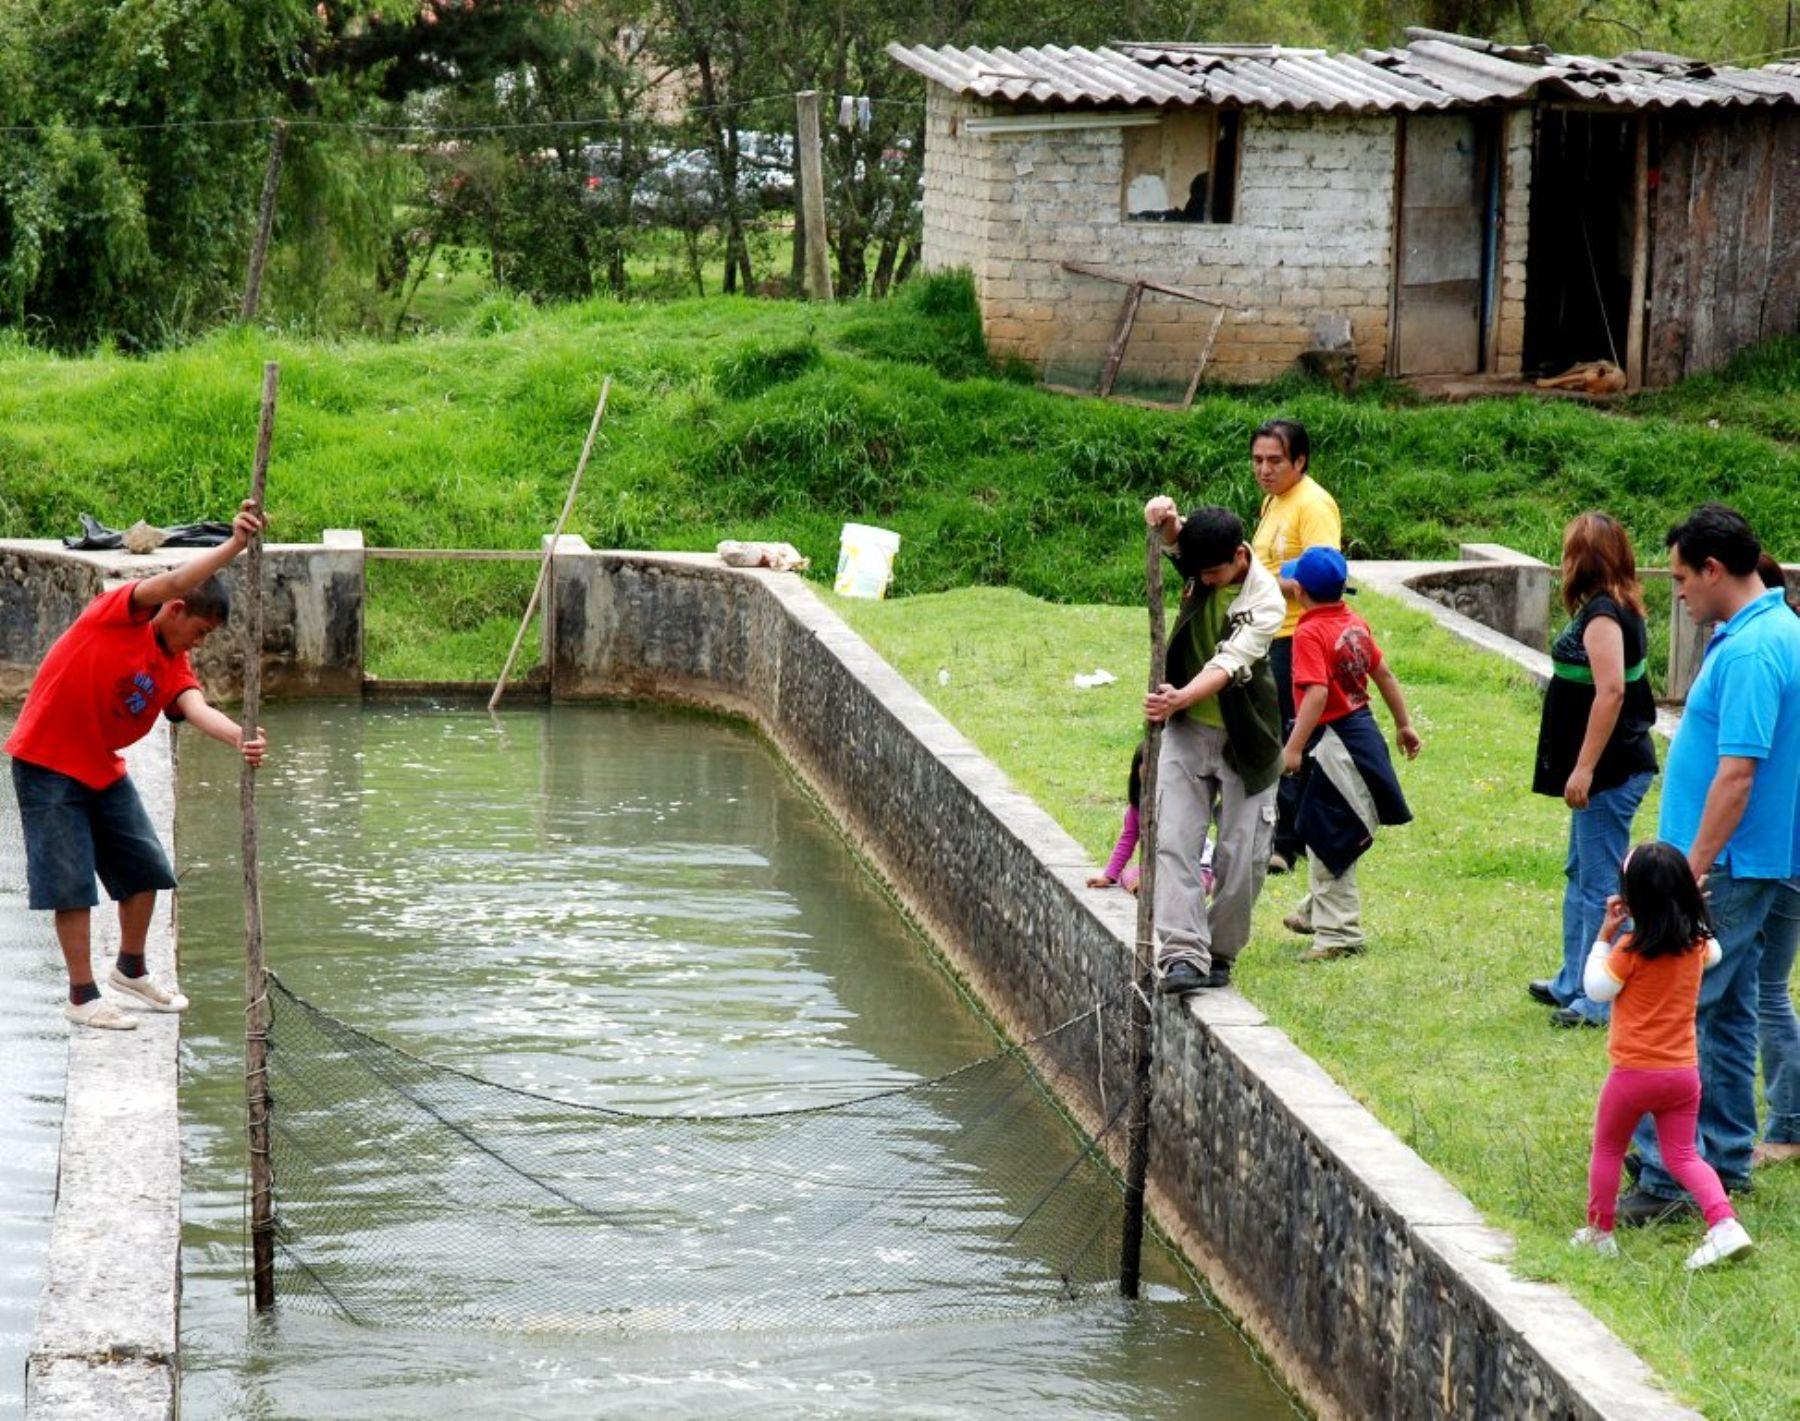 Cosecha de acuicultura crece en per y producci n podr a for Crianza de tilapia en estanques